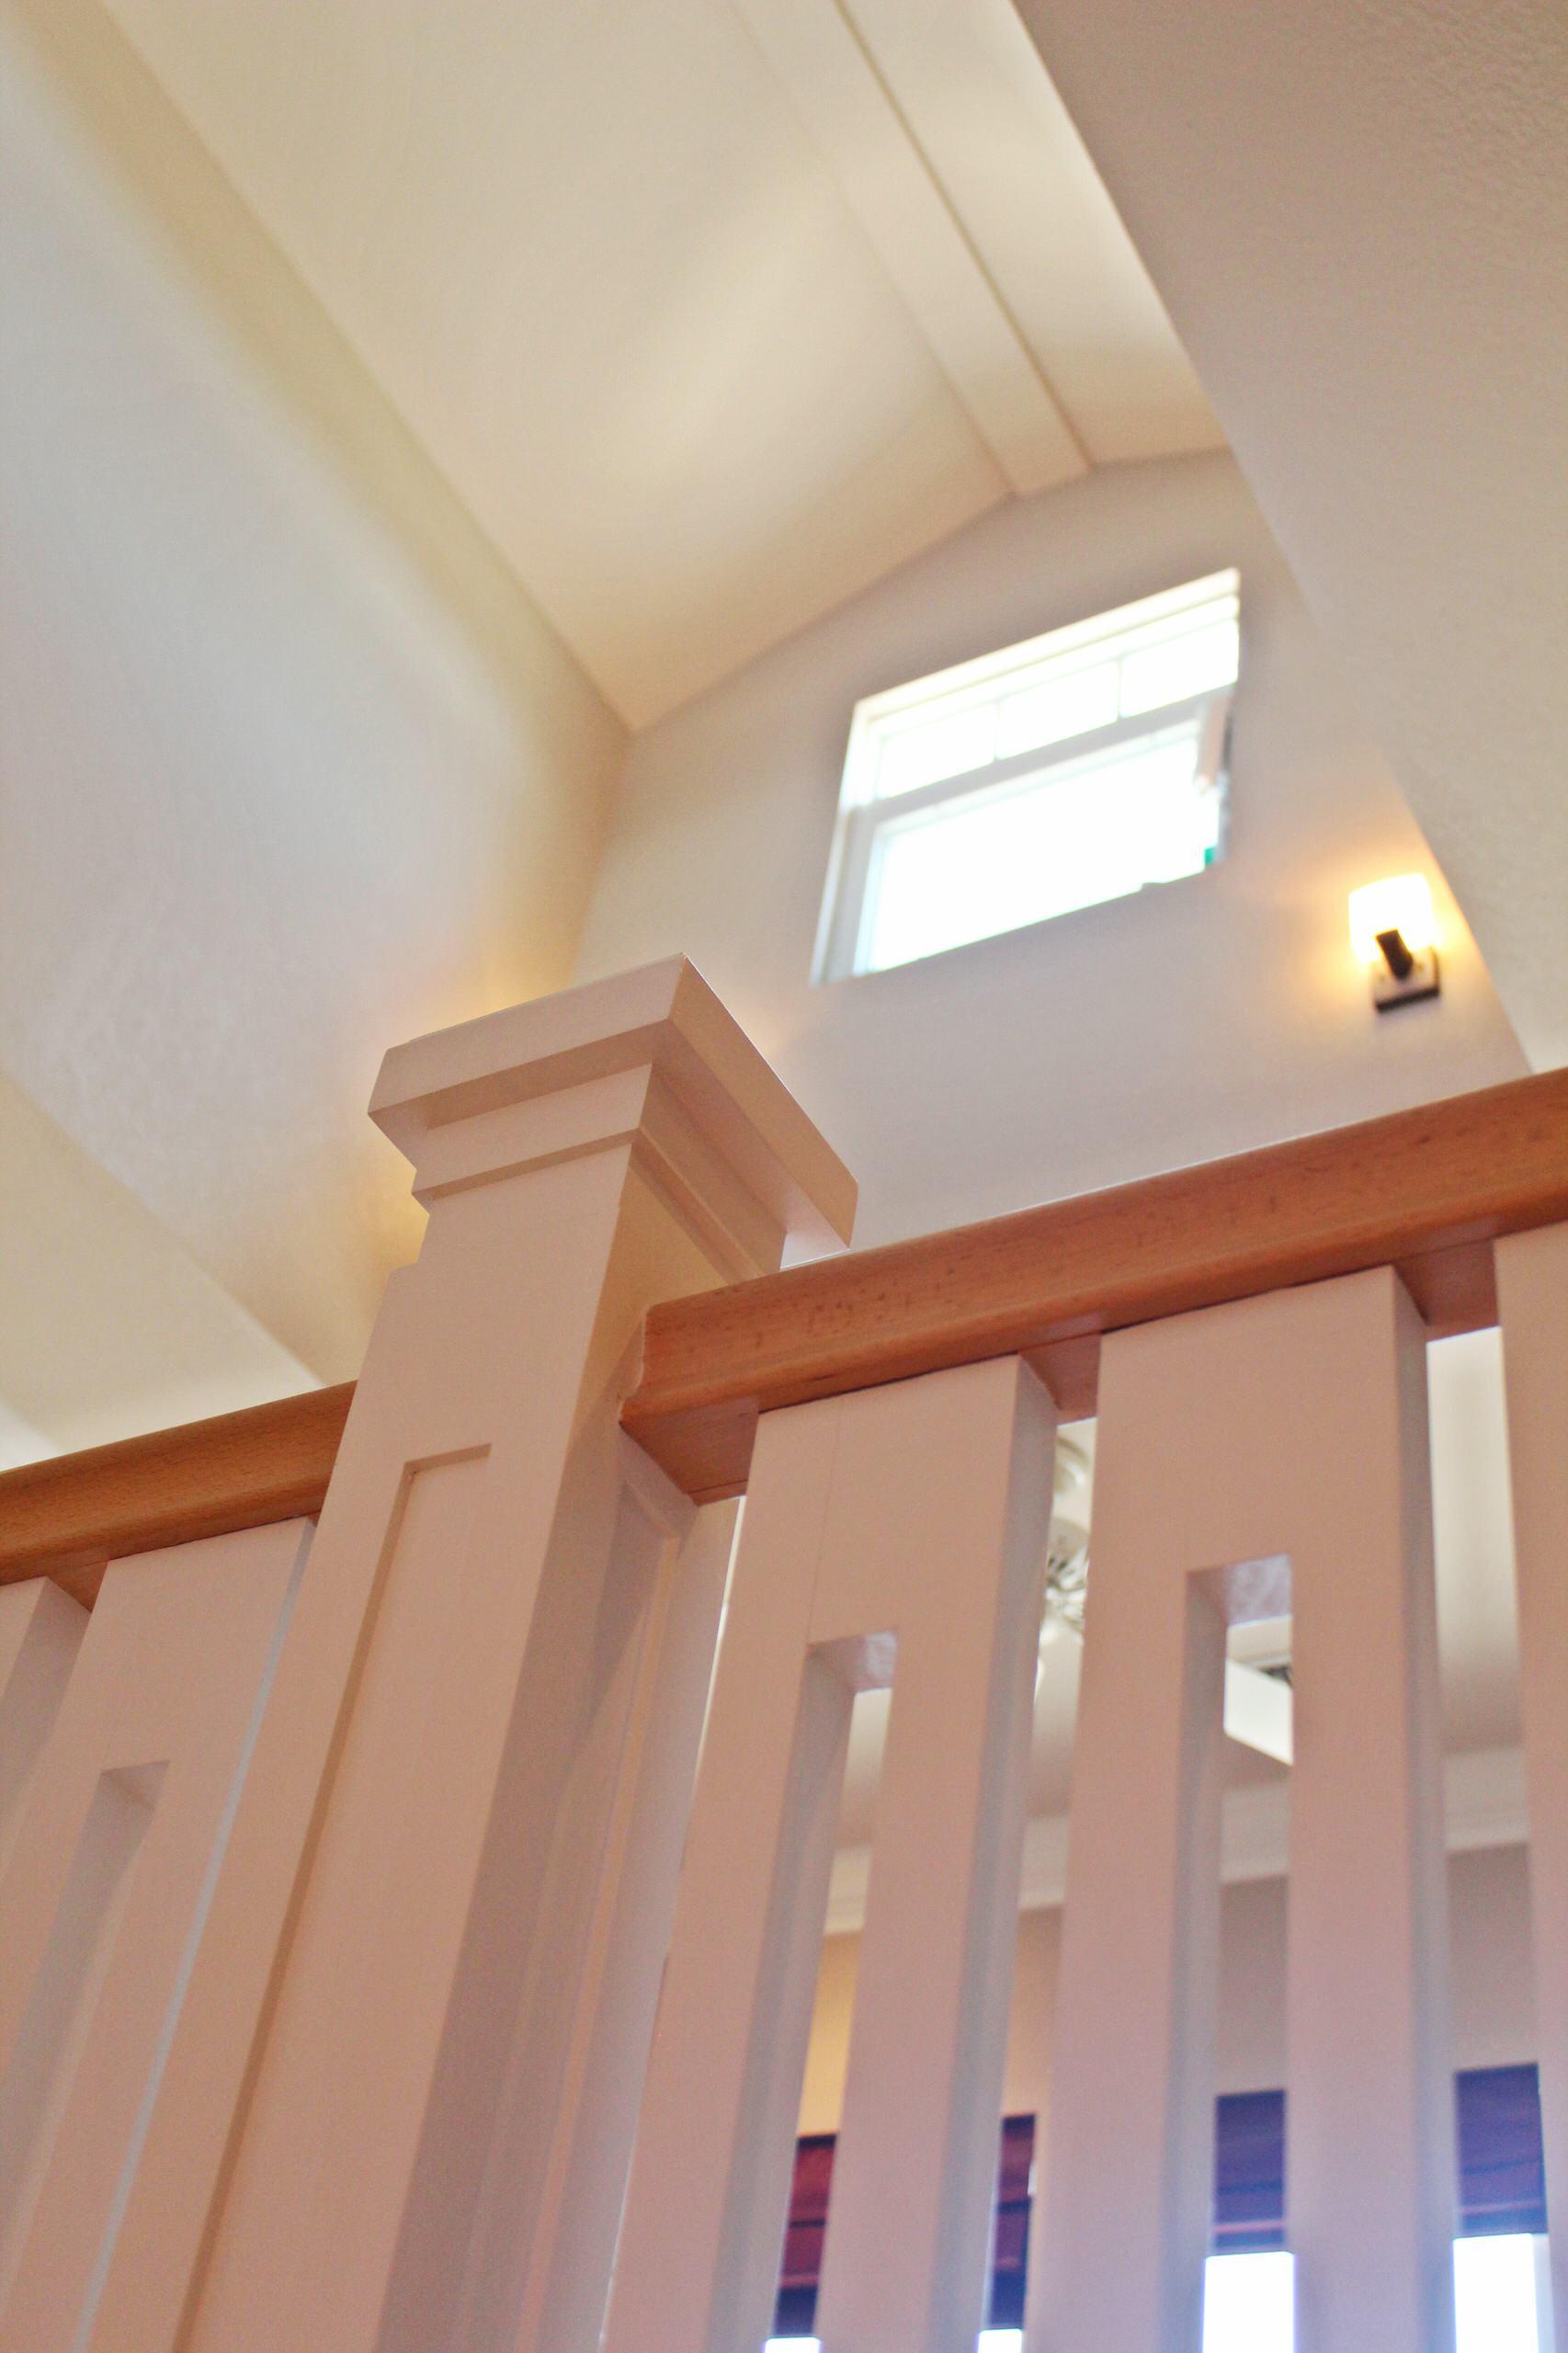 Loft with clerestory windows